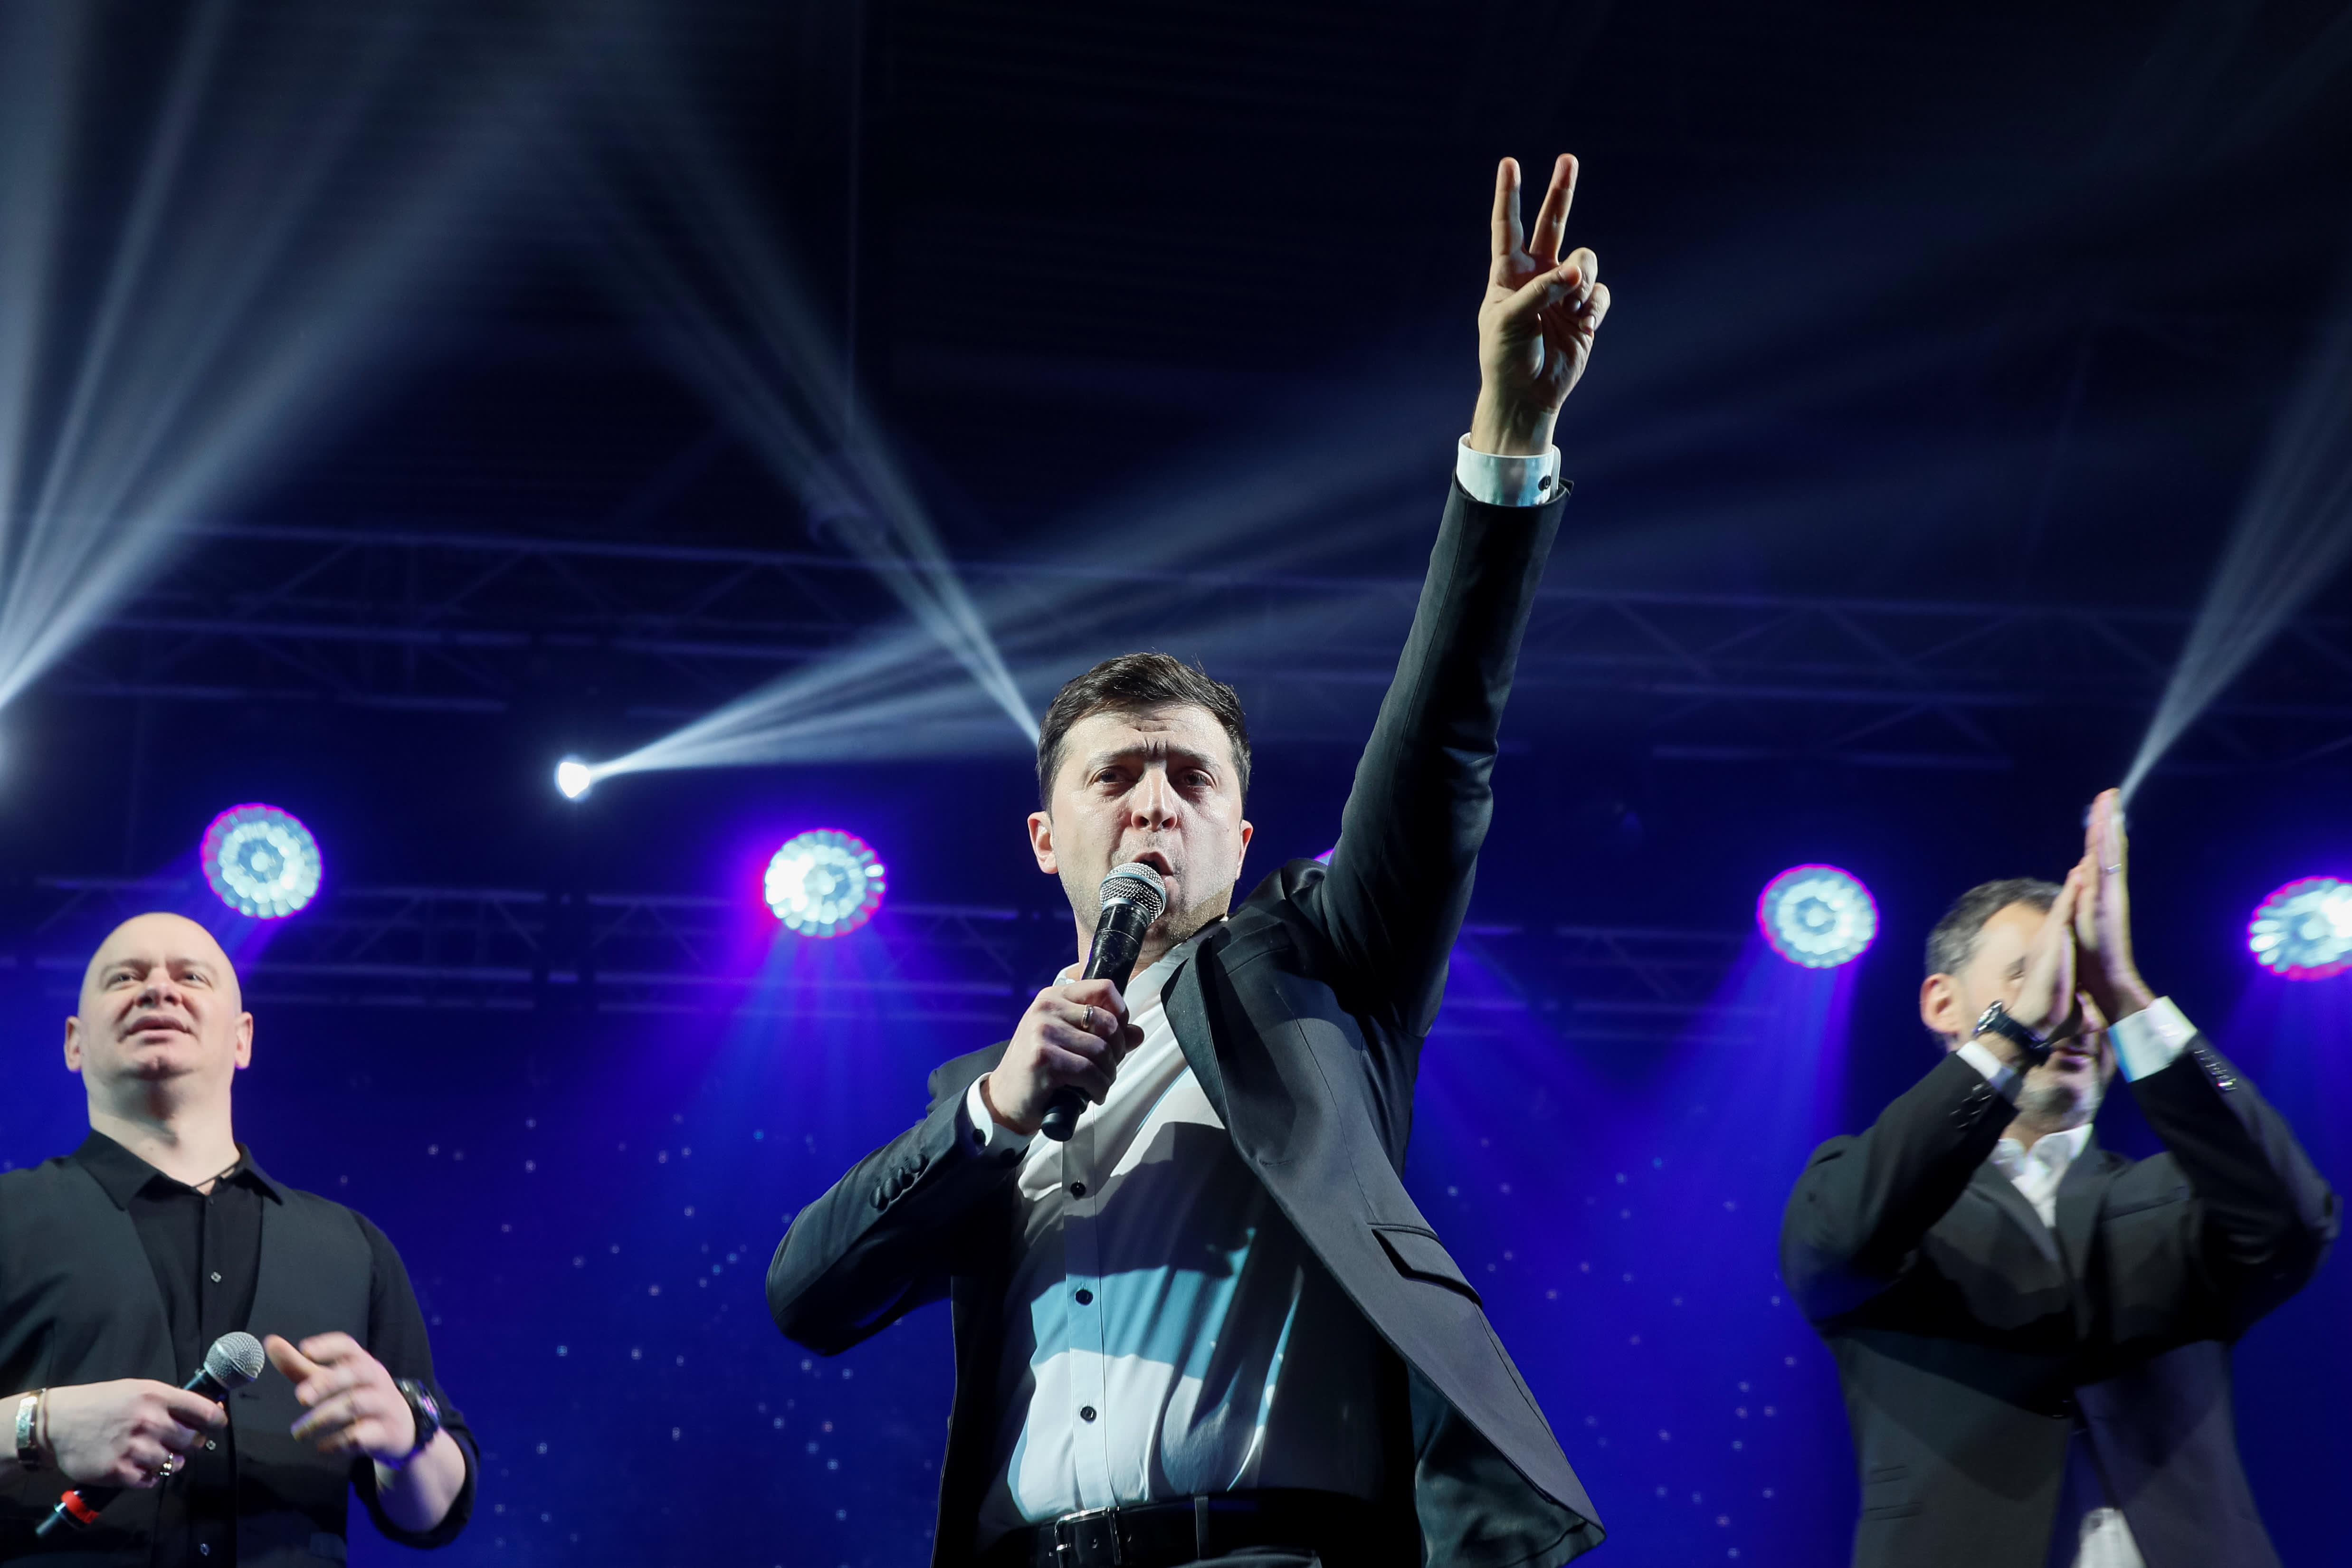 Comedian Zelenskiy wins Ukrainian presidential race by landslide: exit poll